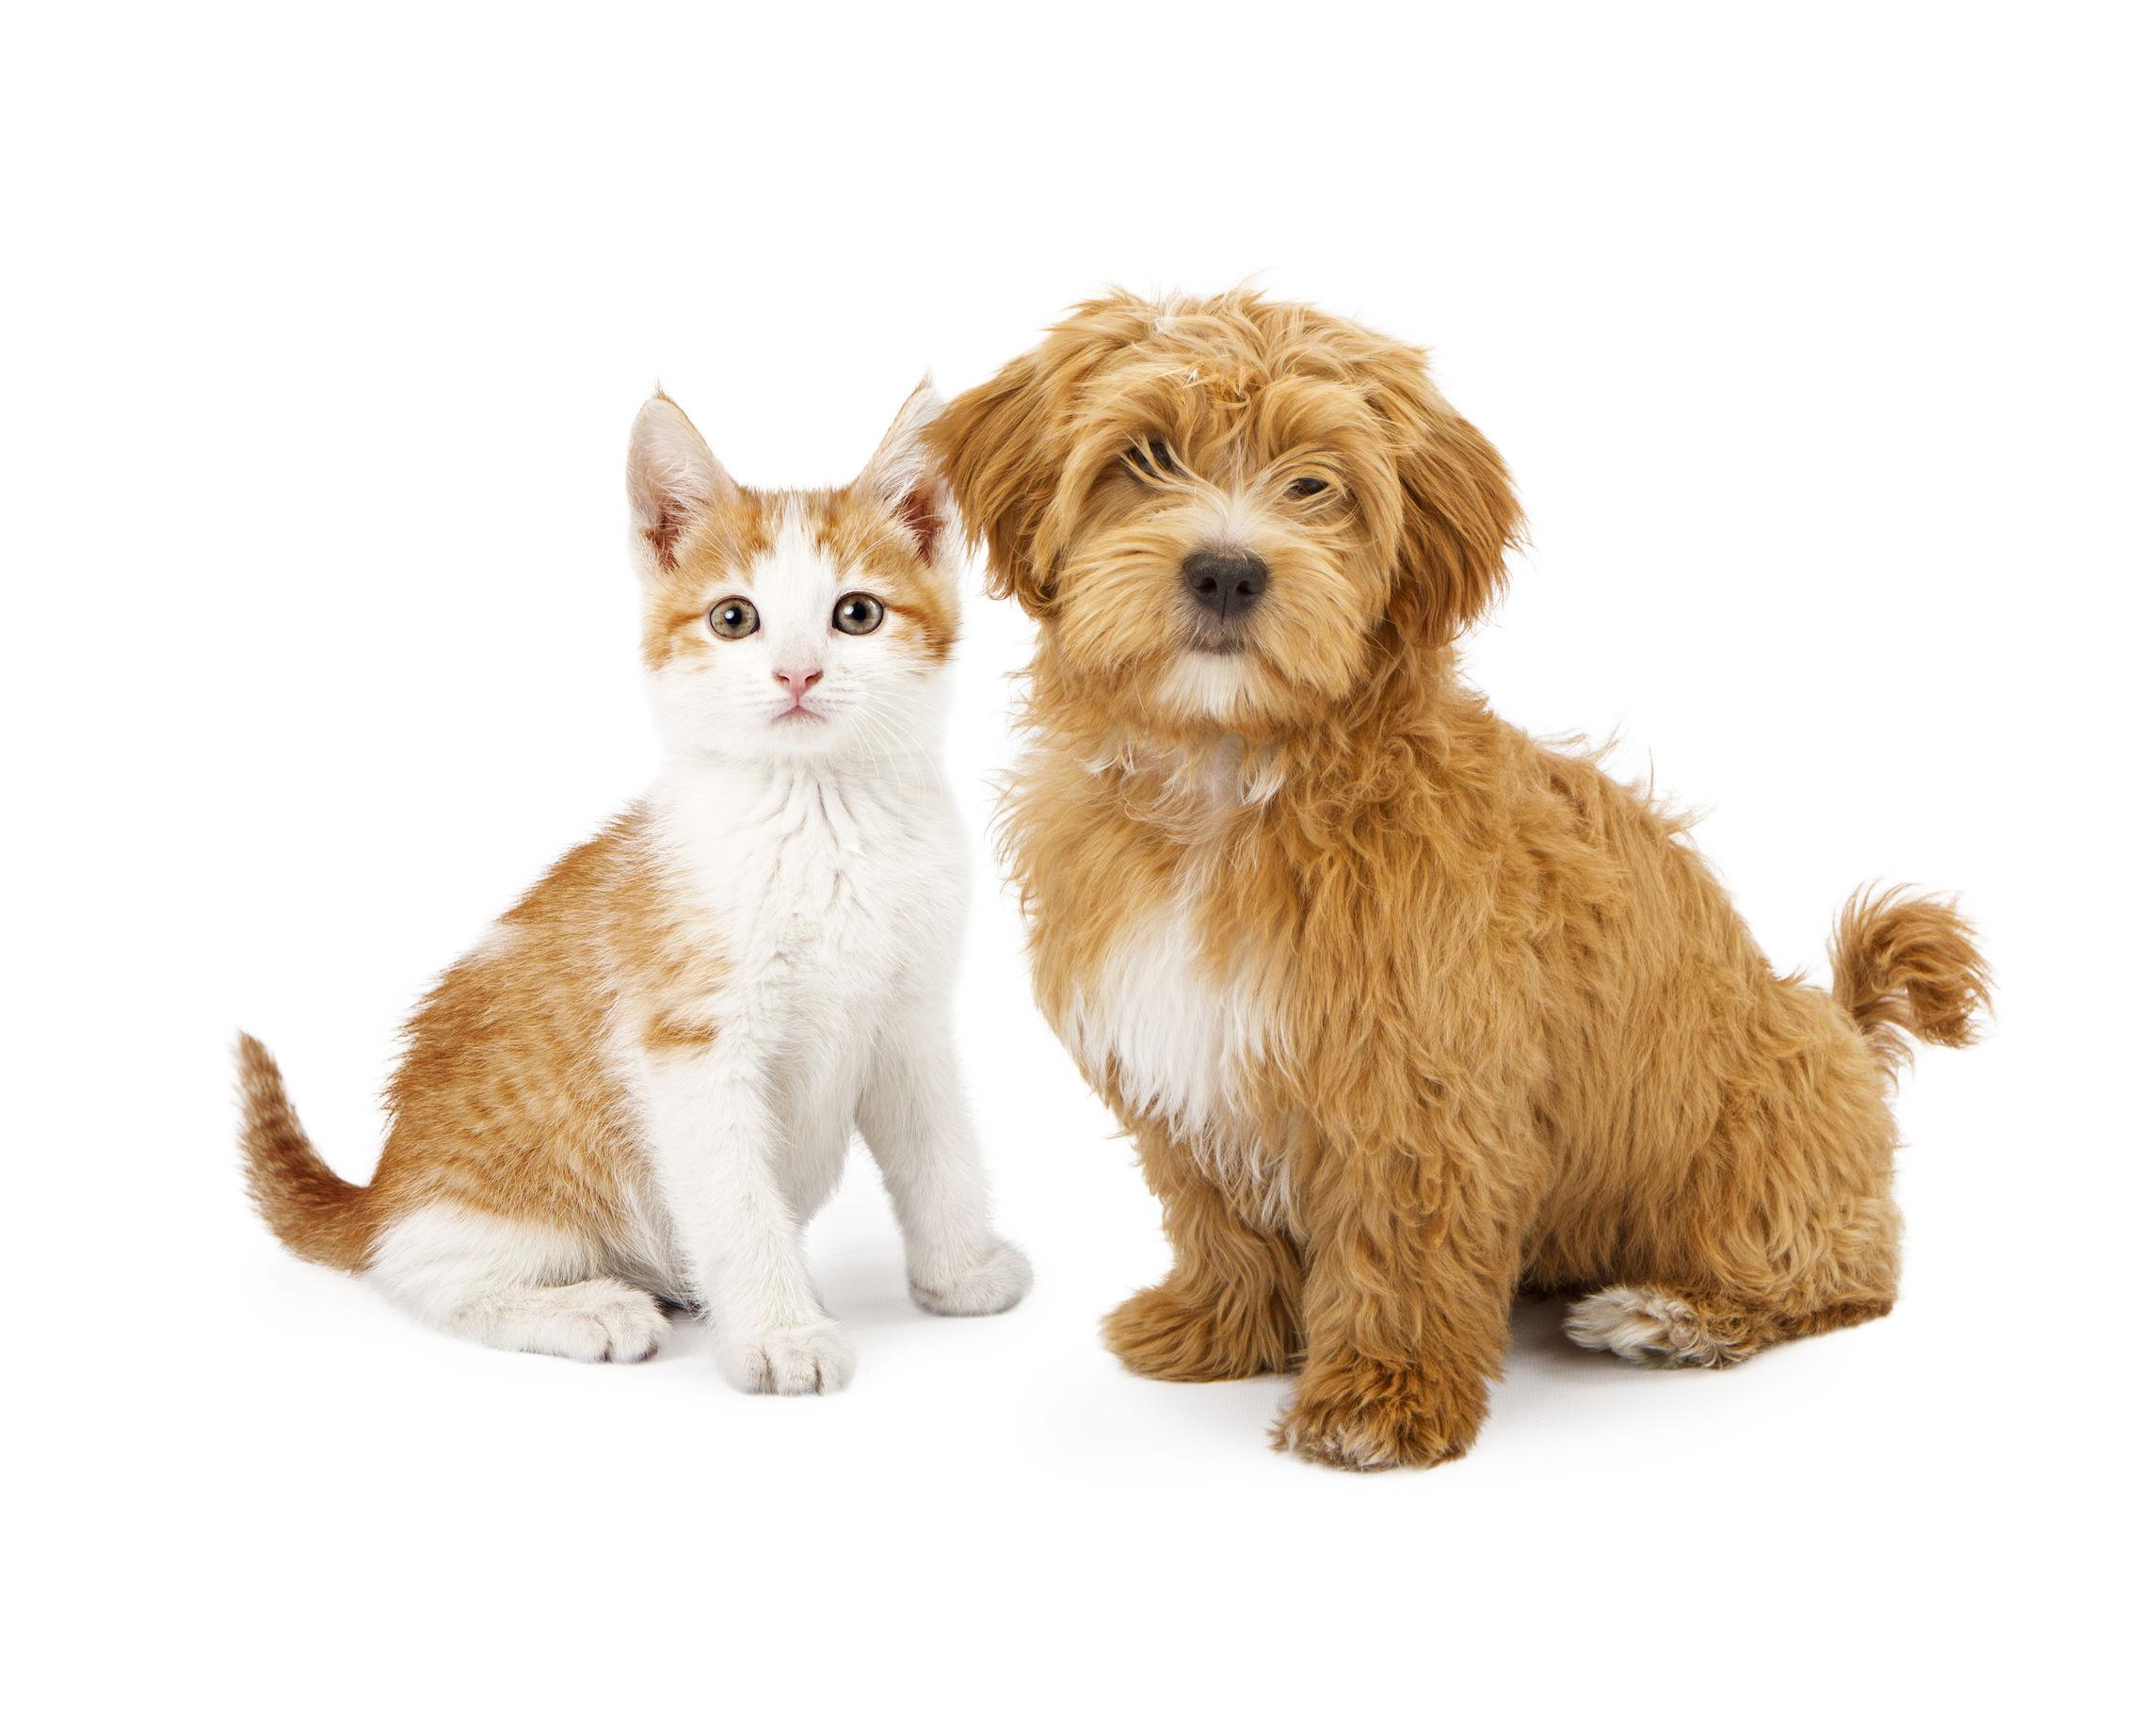 Orange and White Puppy and Kitten